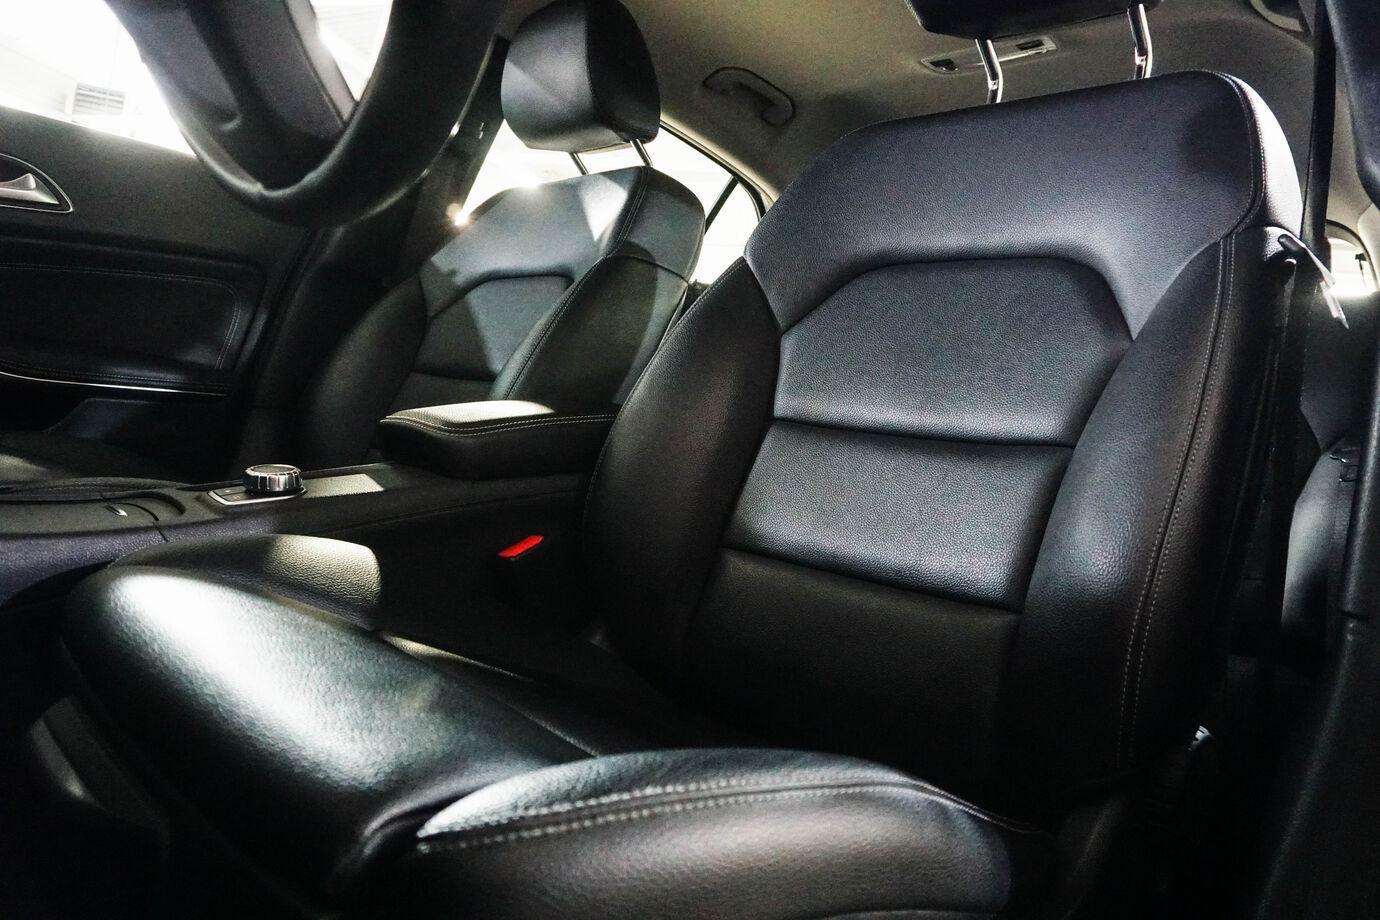 Mercedes-Benz GLA, I (X156) 2016г.